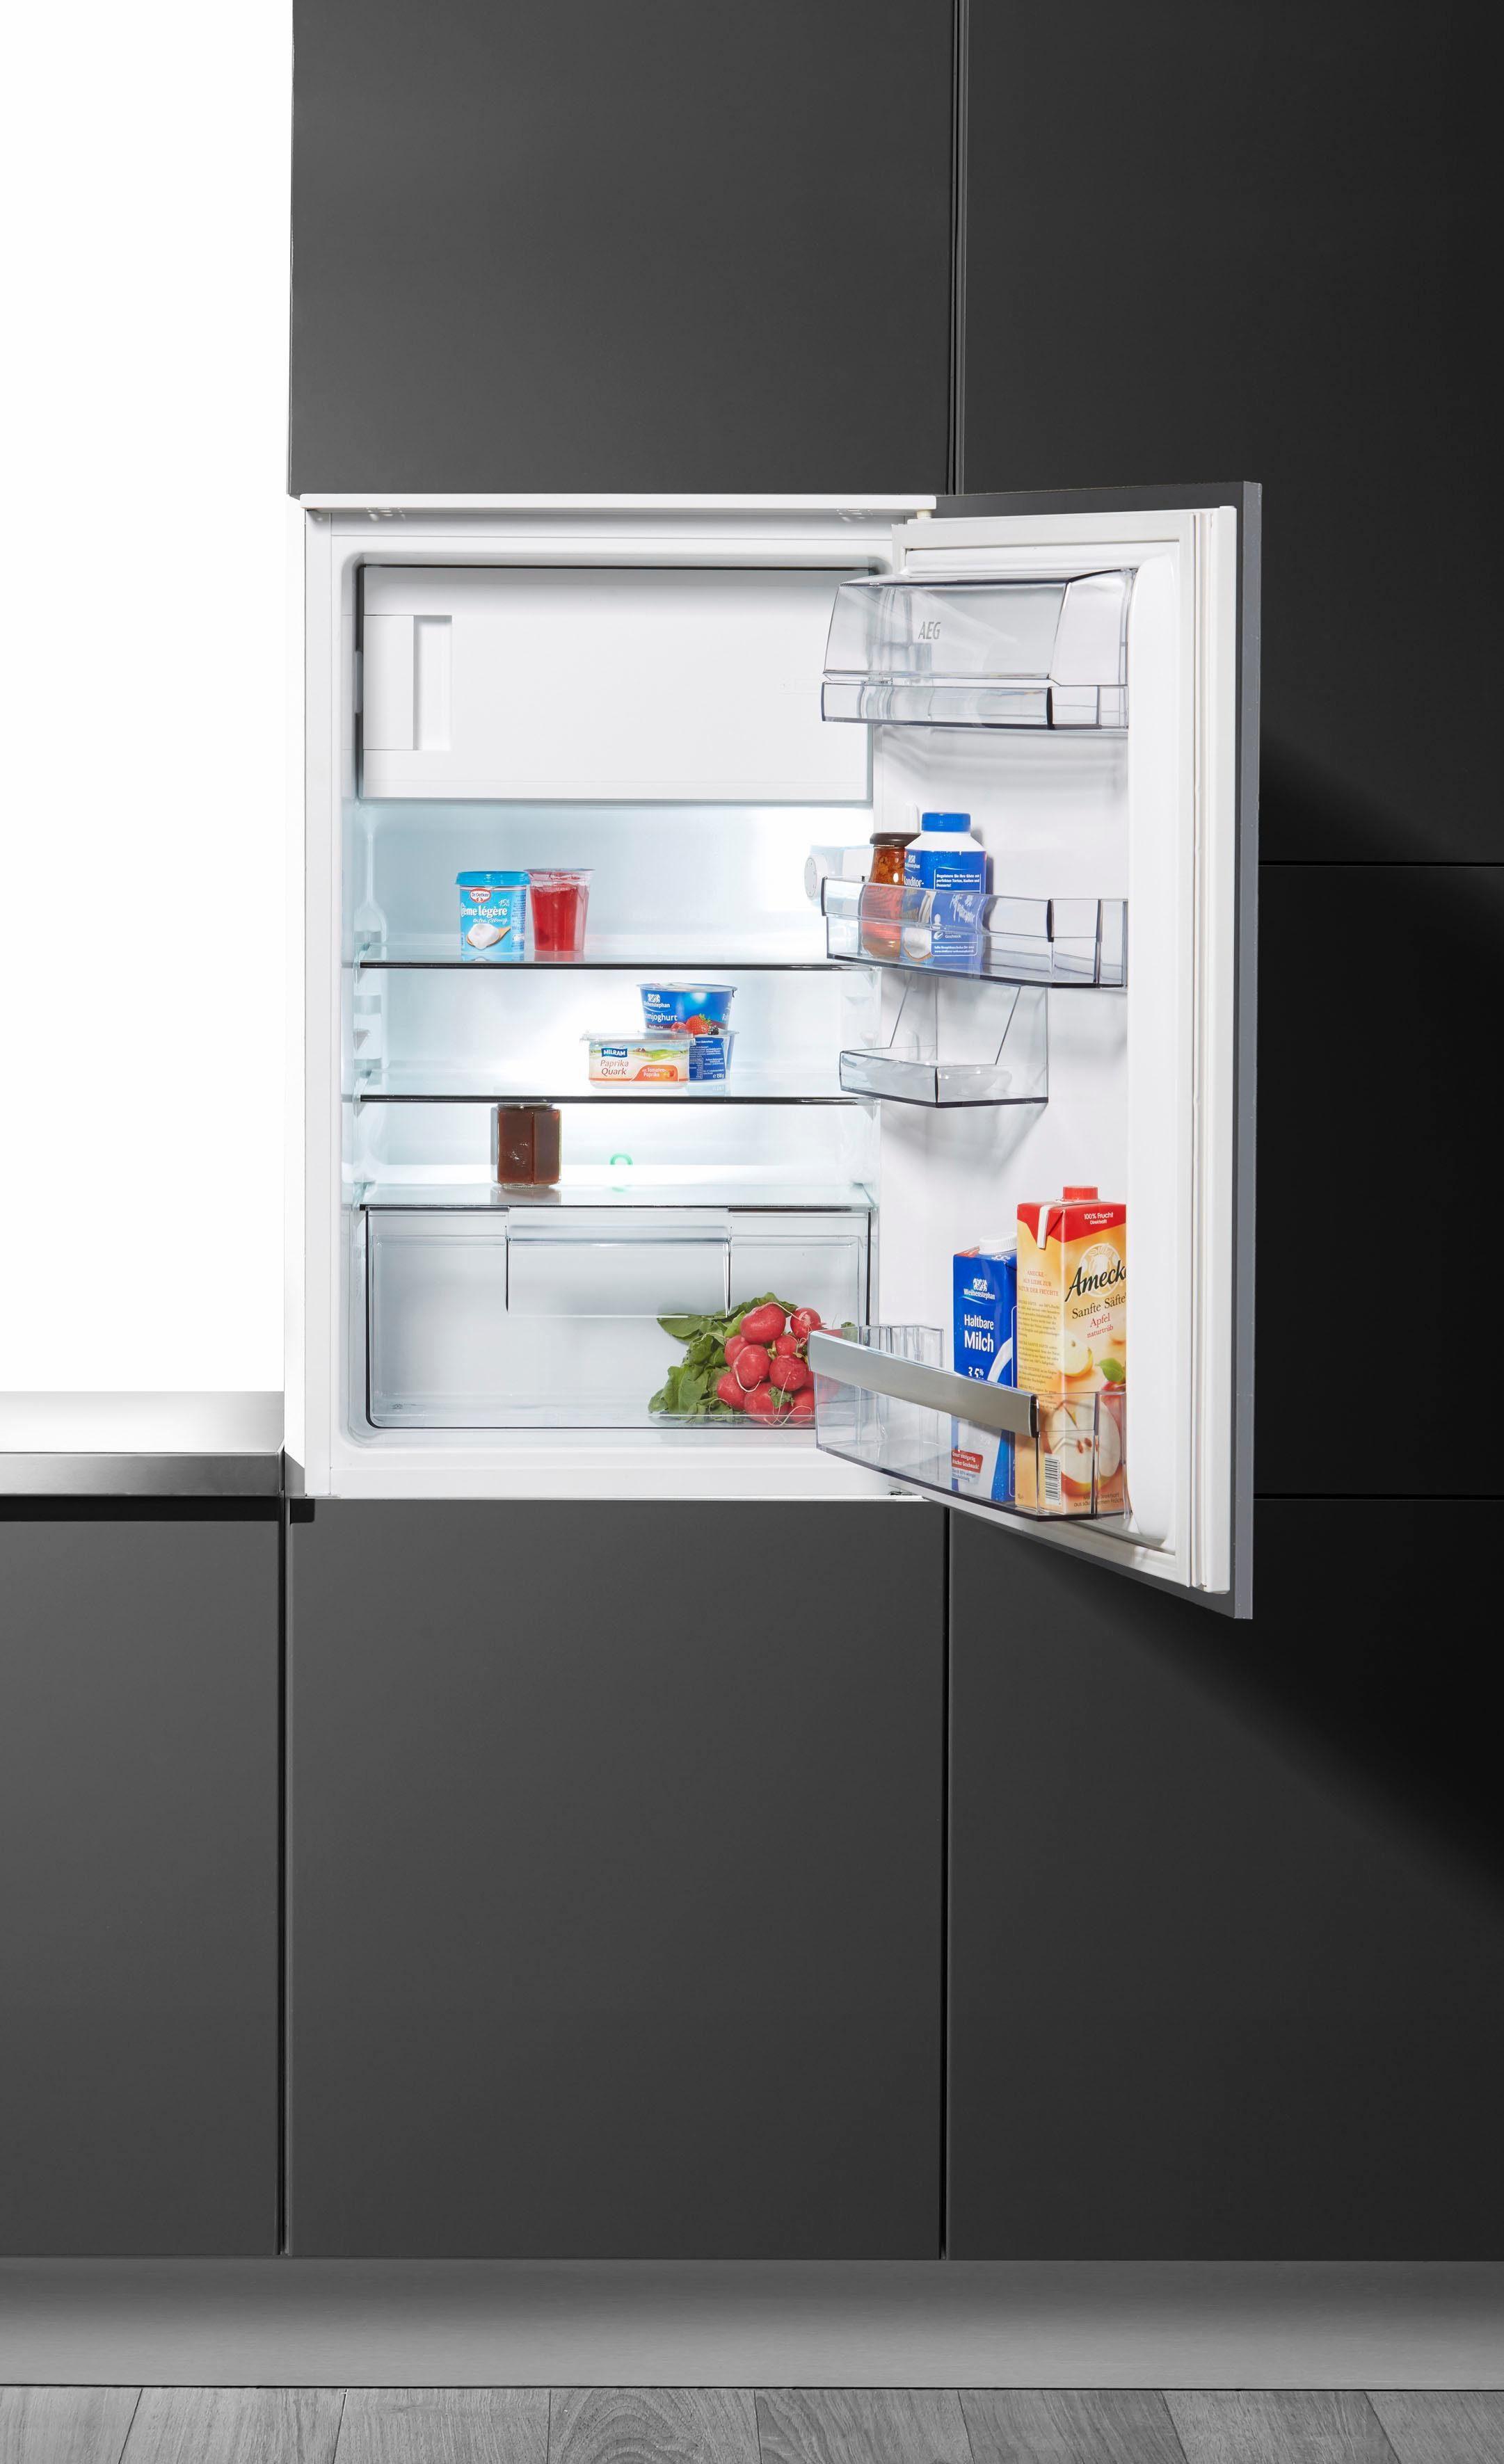 AEG integrierbarer Einbaukühlschrank Santo SFB58821AS, Energieklasse A++, 87,3 cm hoch